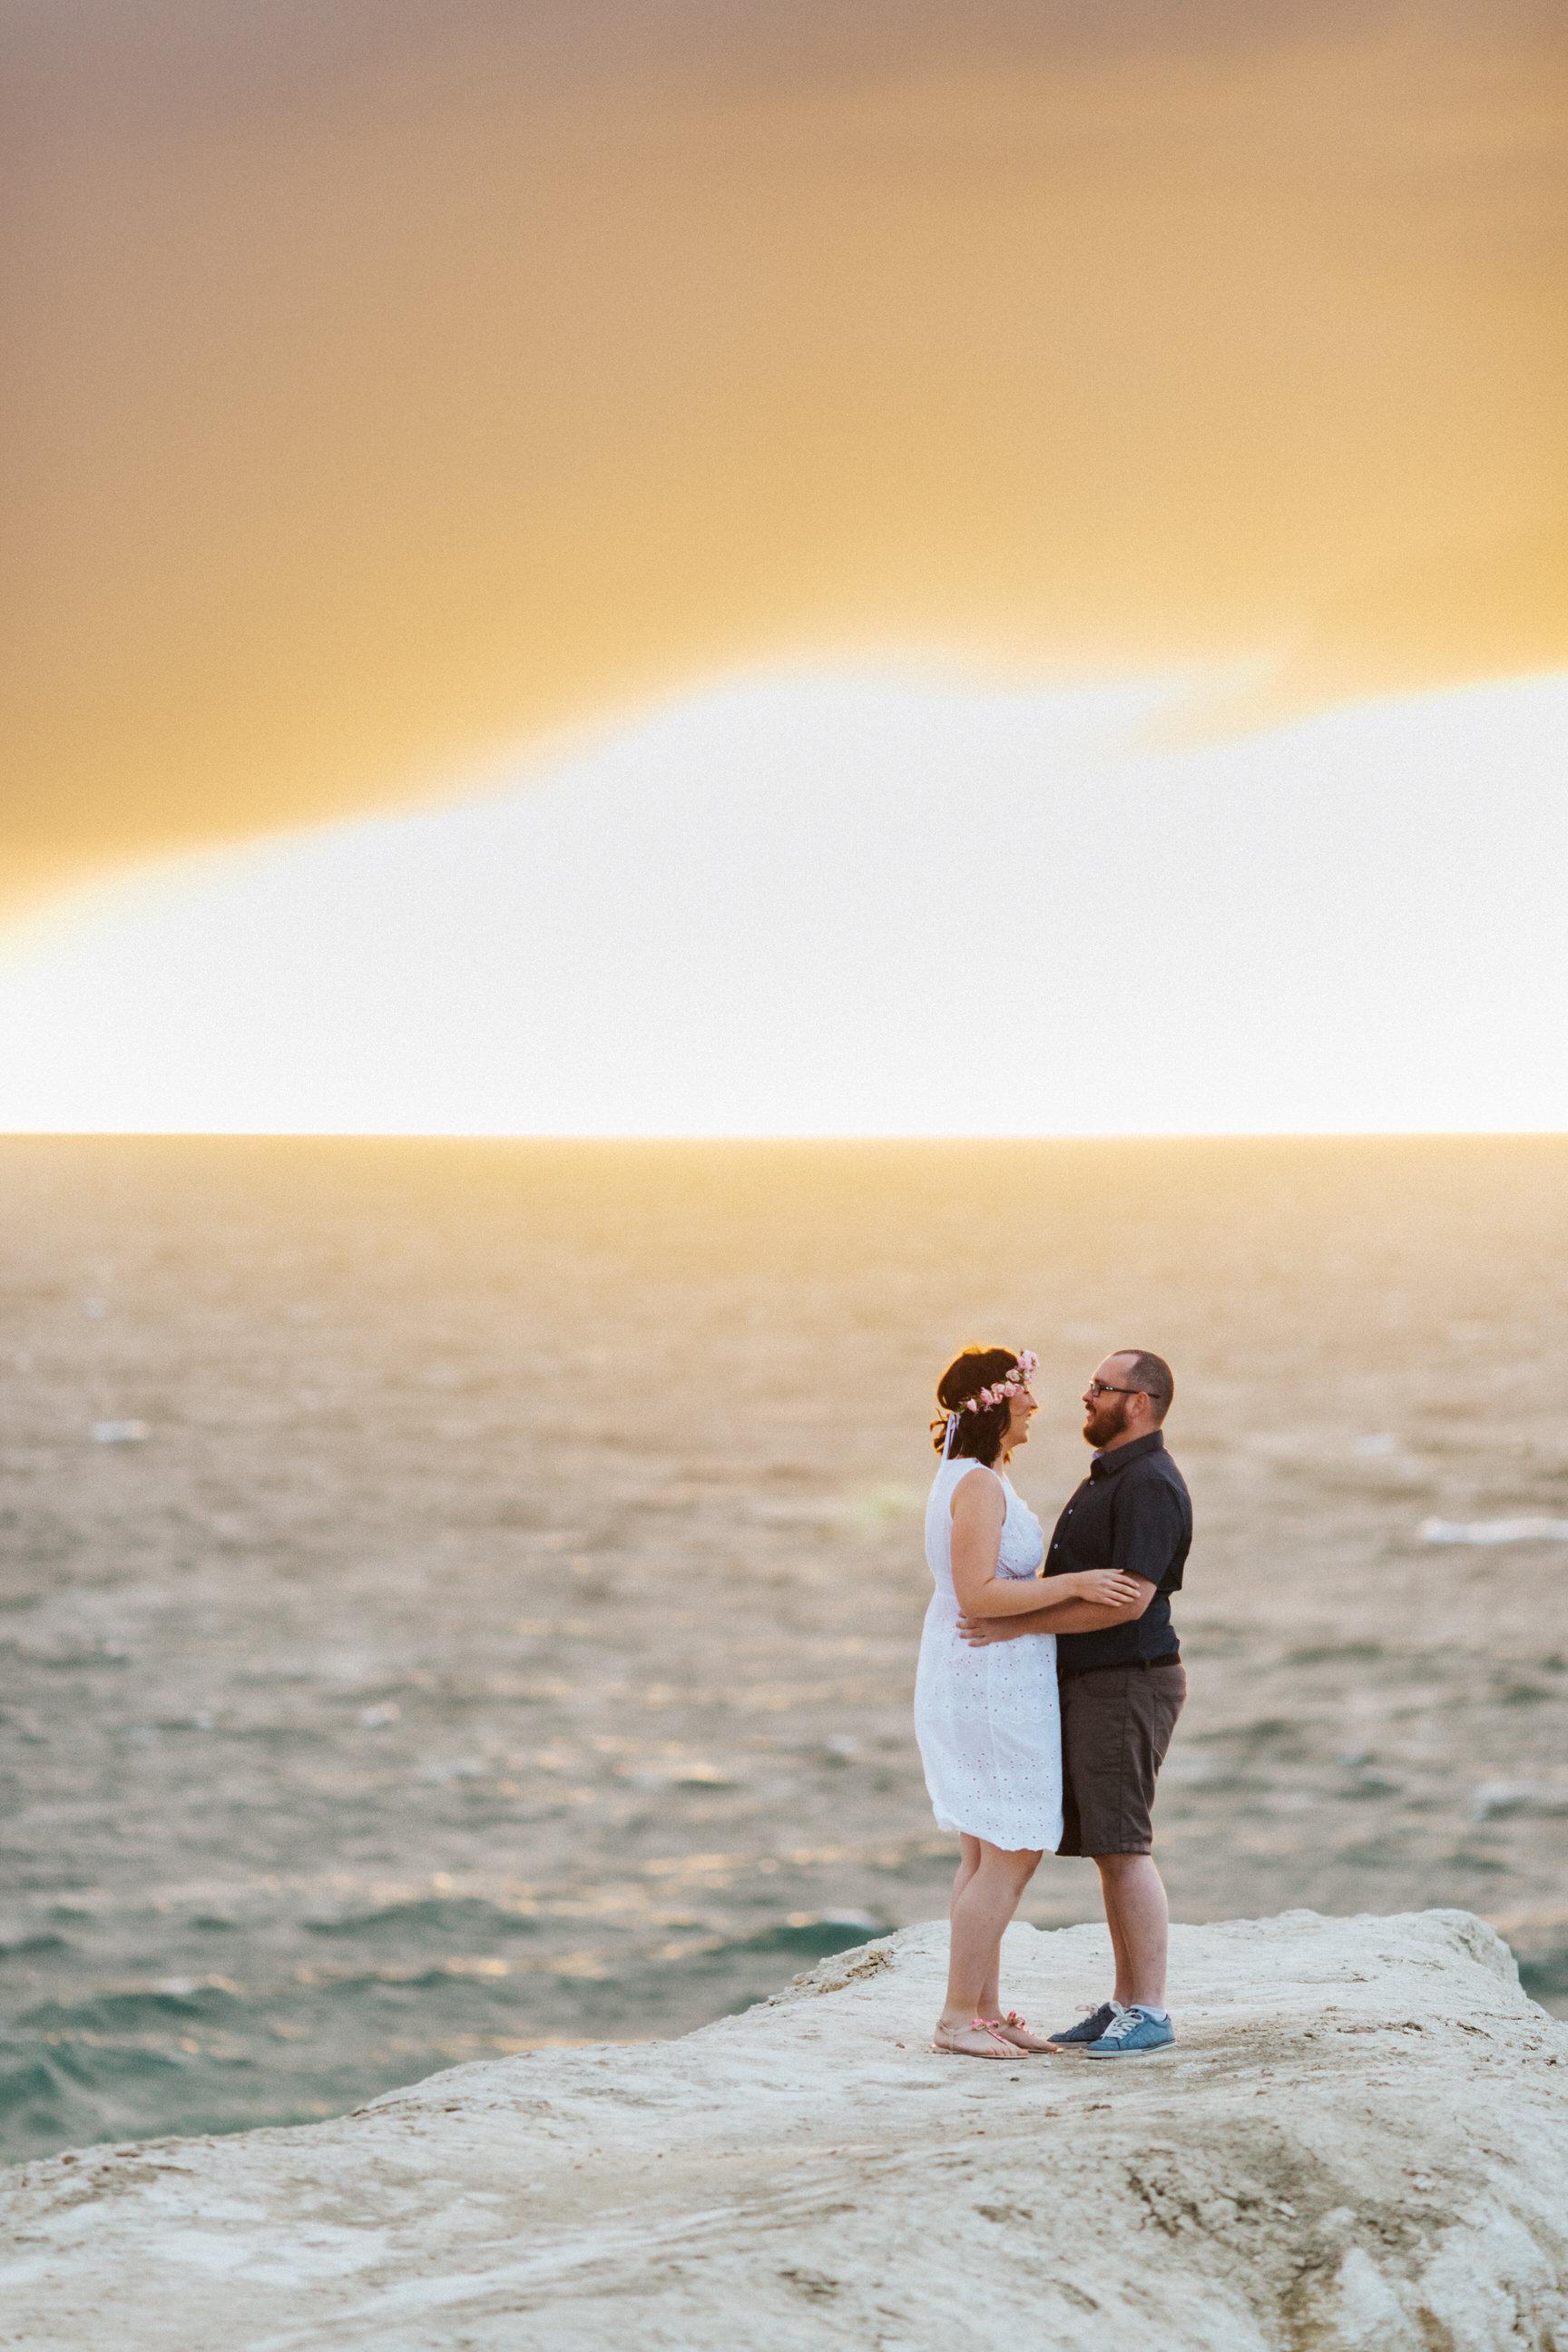 Sunset Beach Portraits Gull Rock South Australia 013.jpg